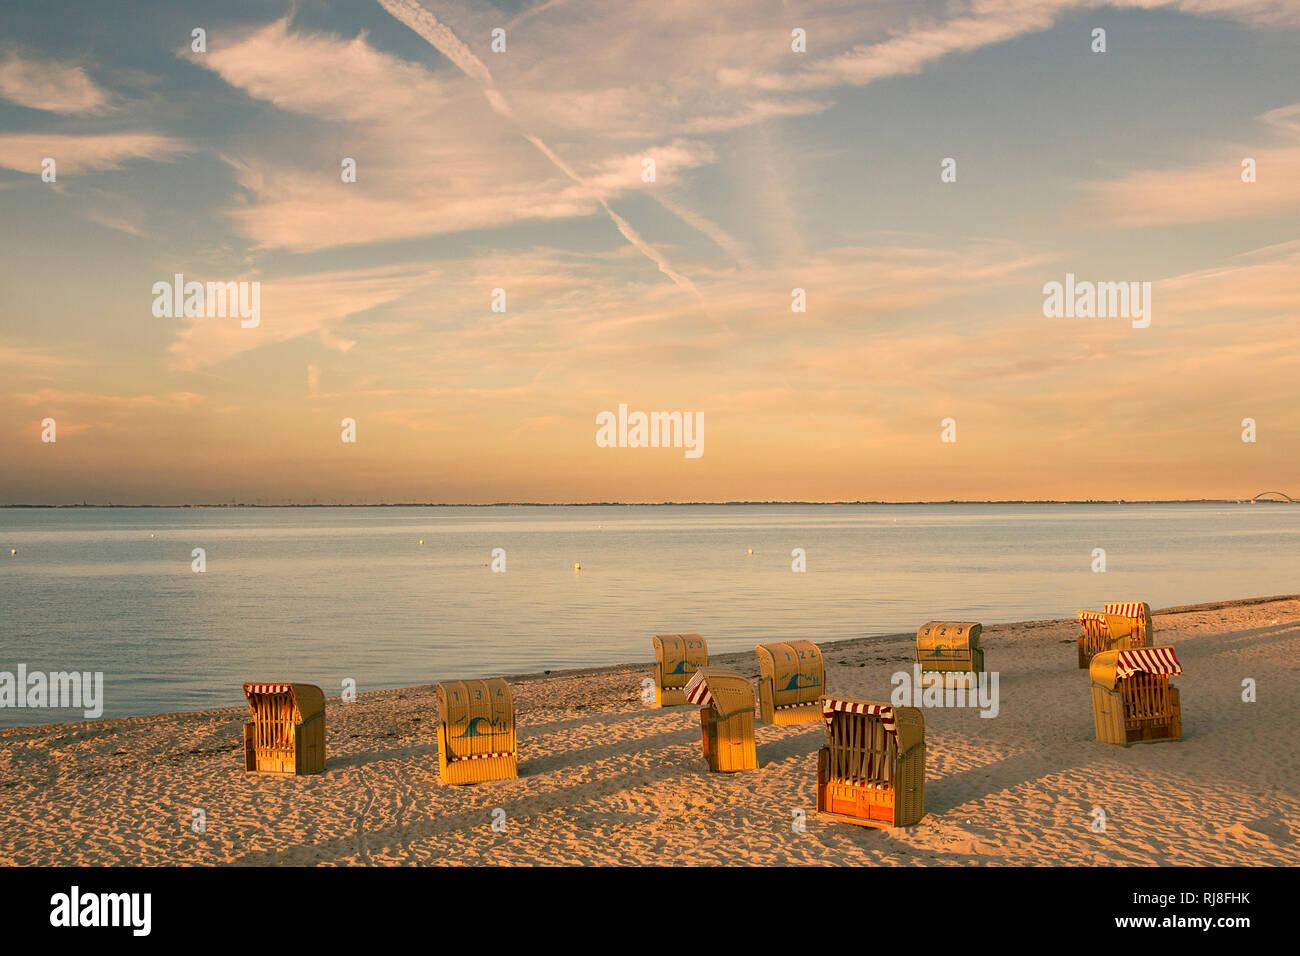 Strandkörbe im Abendlicht - Stock Image